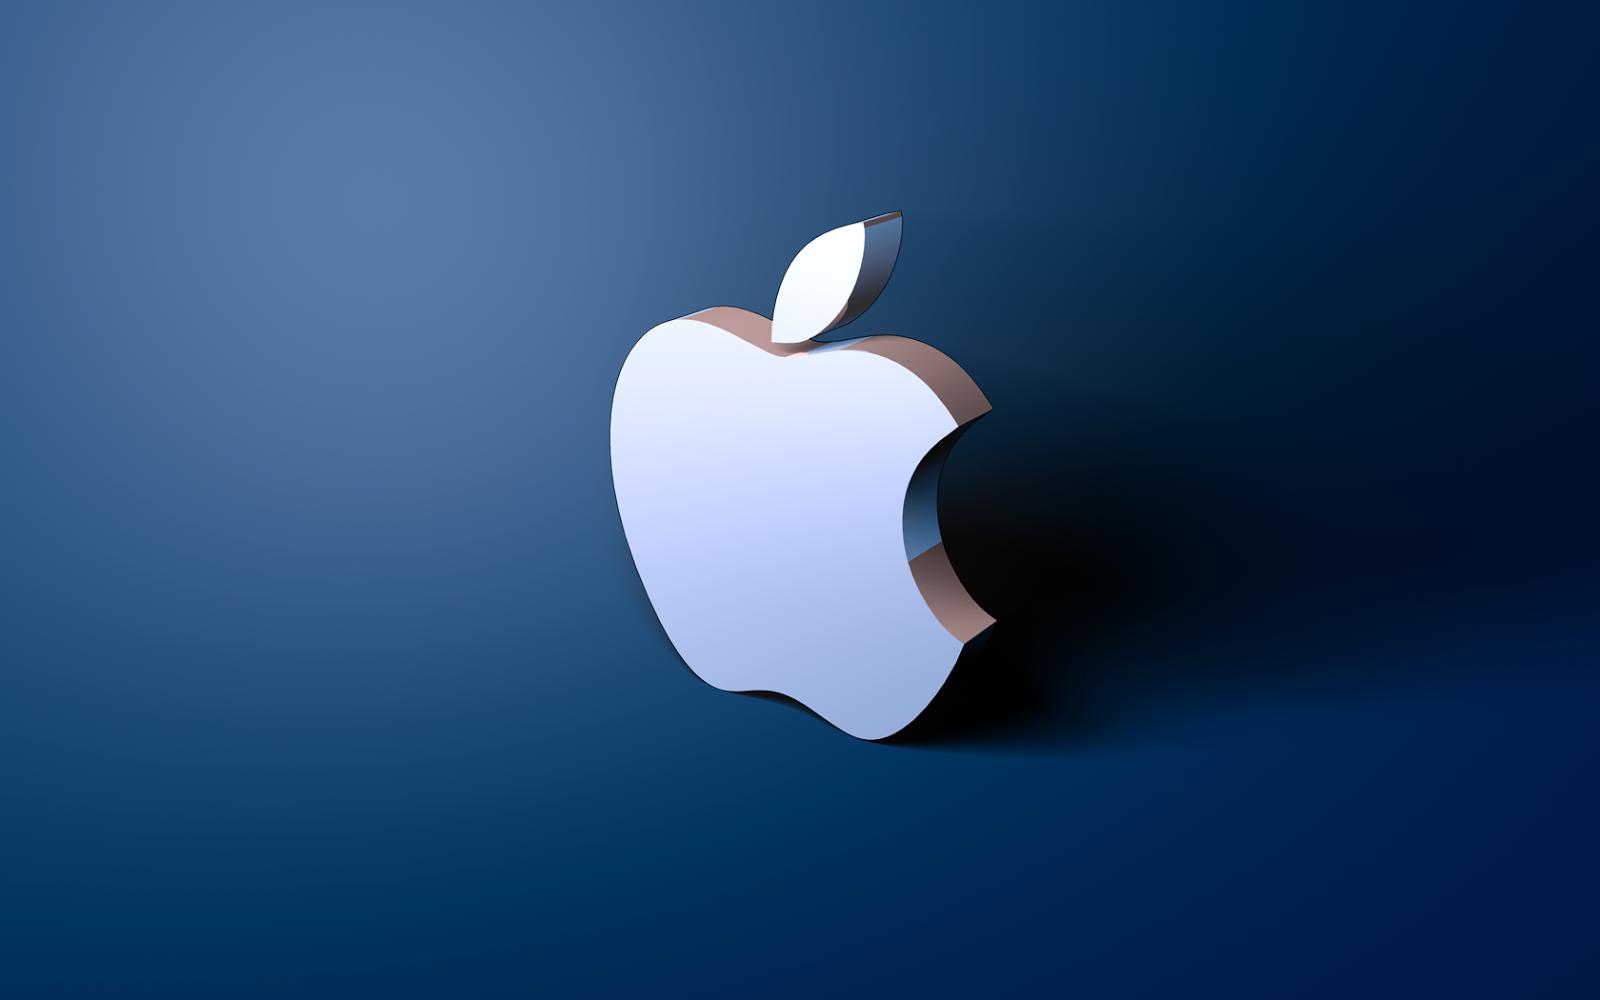 Desktop Apple Wallpaper Hd 1080p Download